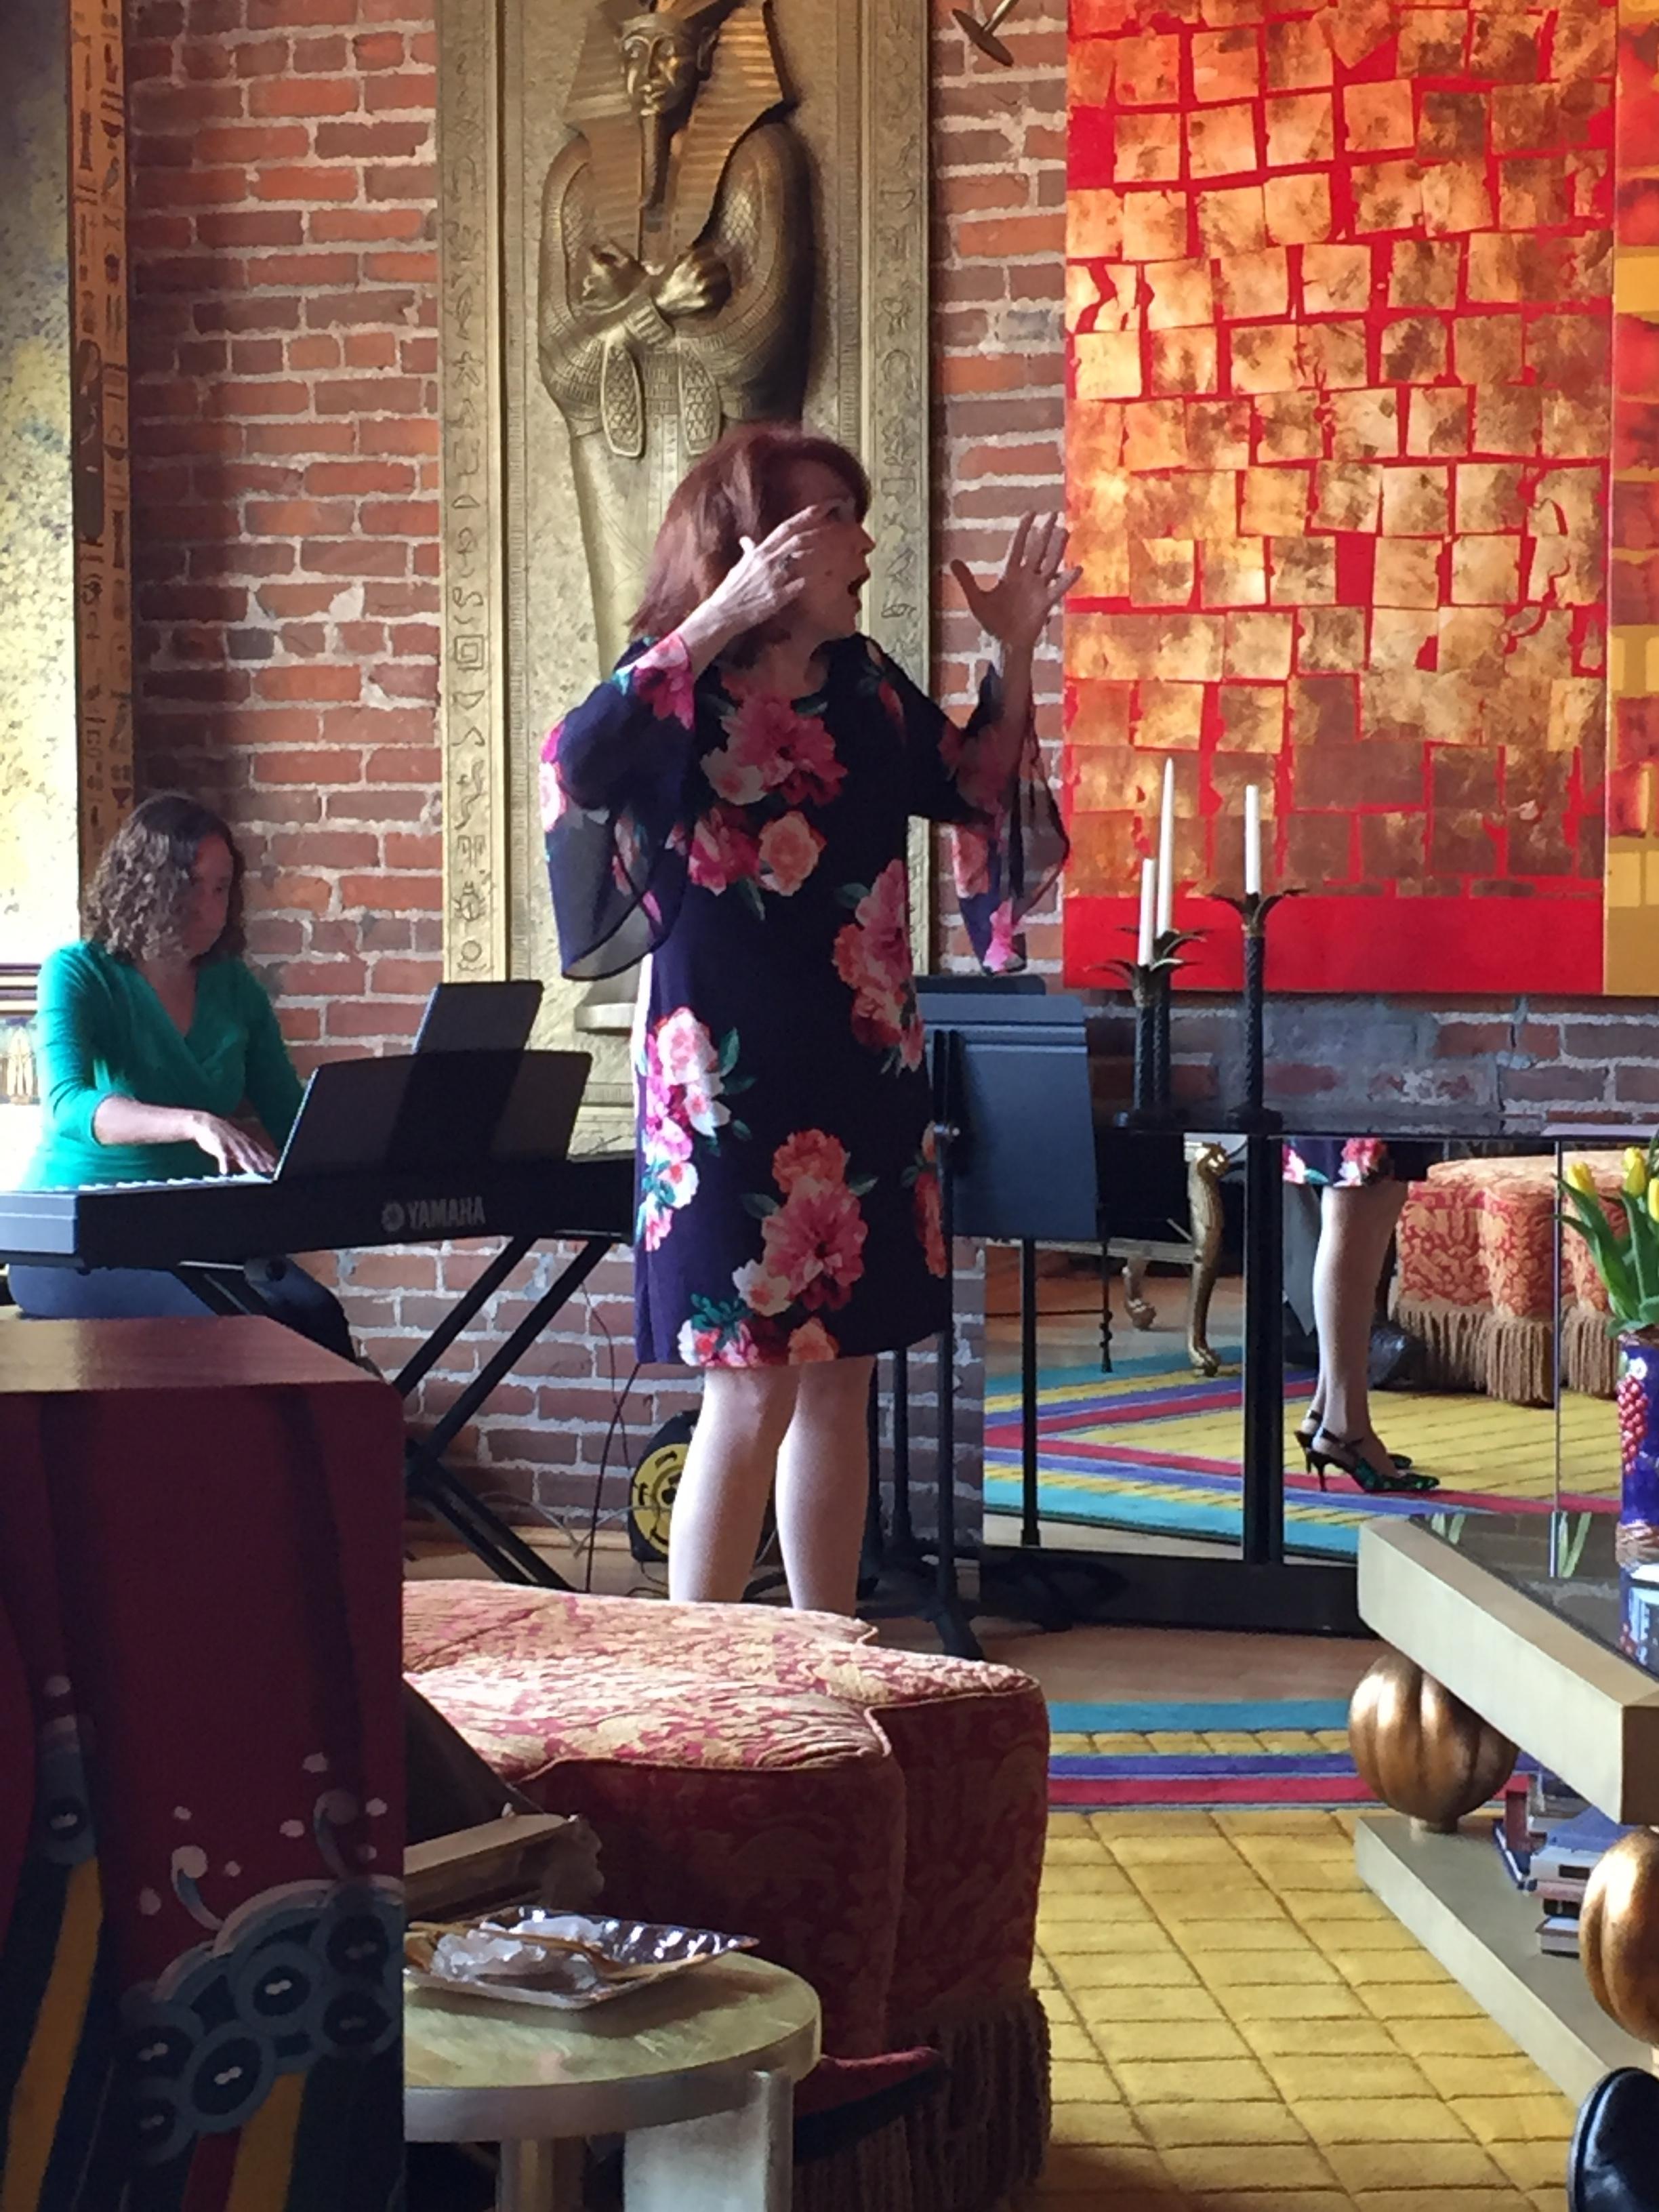 Anne Marie Kenny performing La Vie en Rose - fantastique!